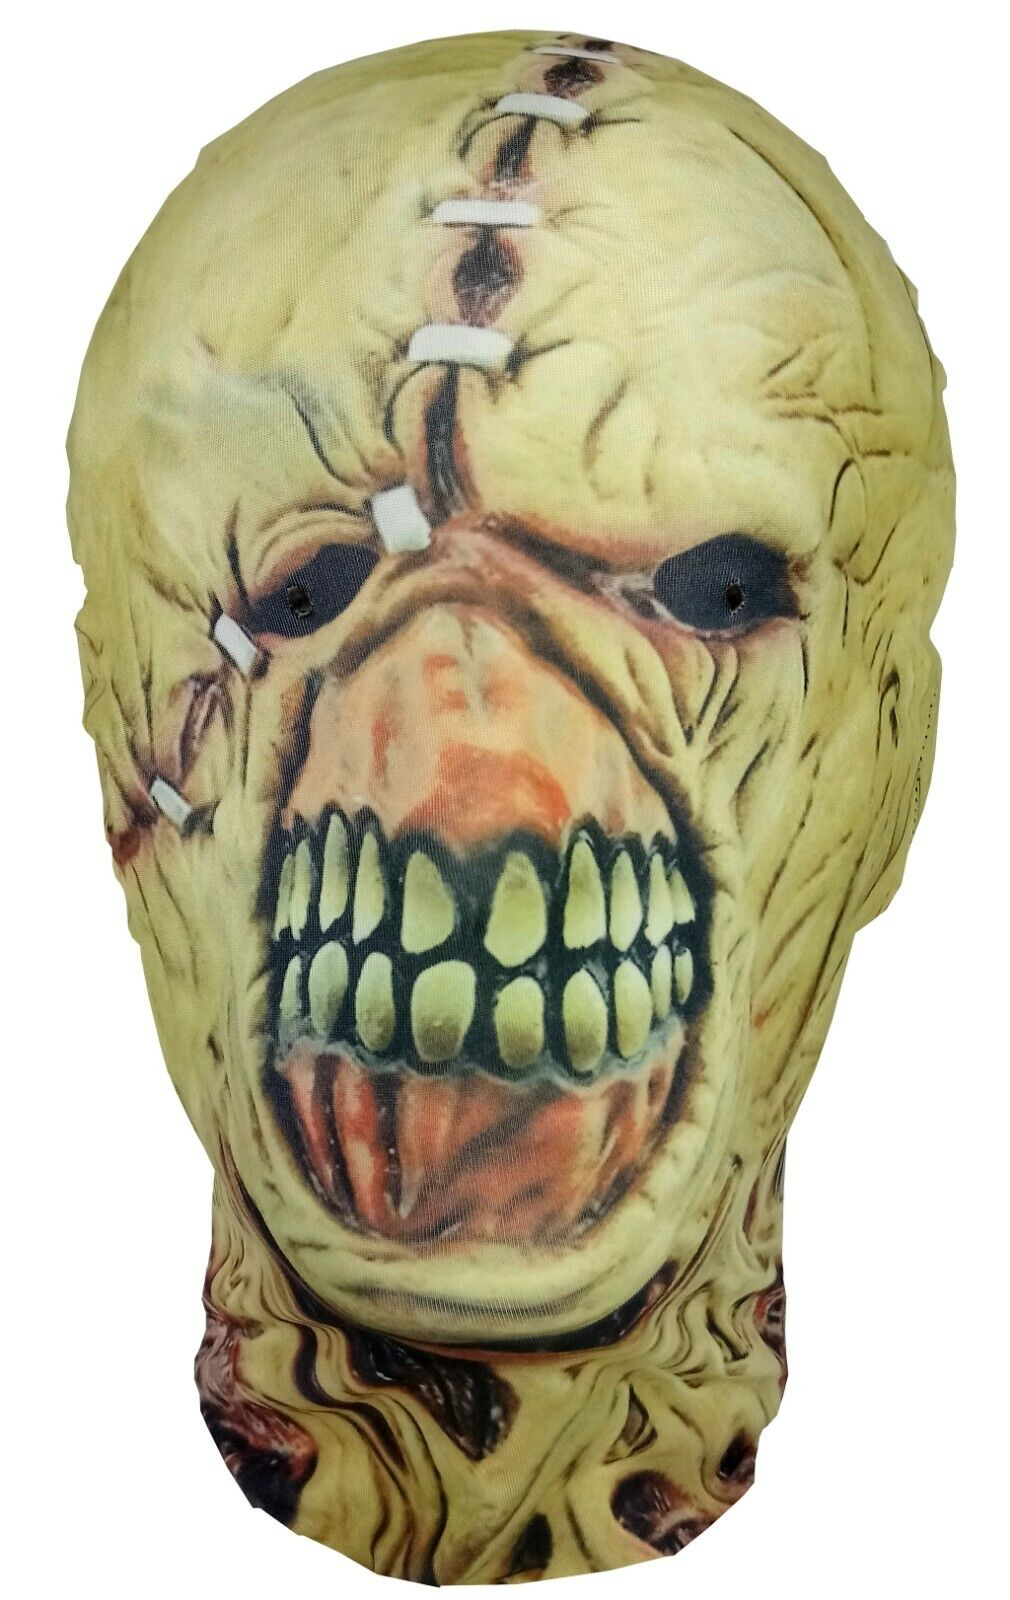 Resident Evil 3 Nemesis Mask Zombie Game Cosplay Prop Replica Fancy Dress Hallow